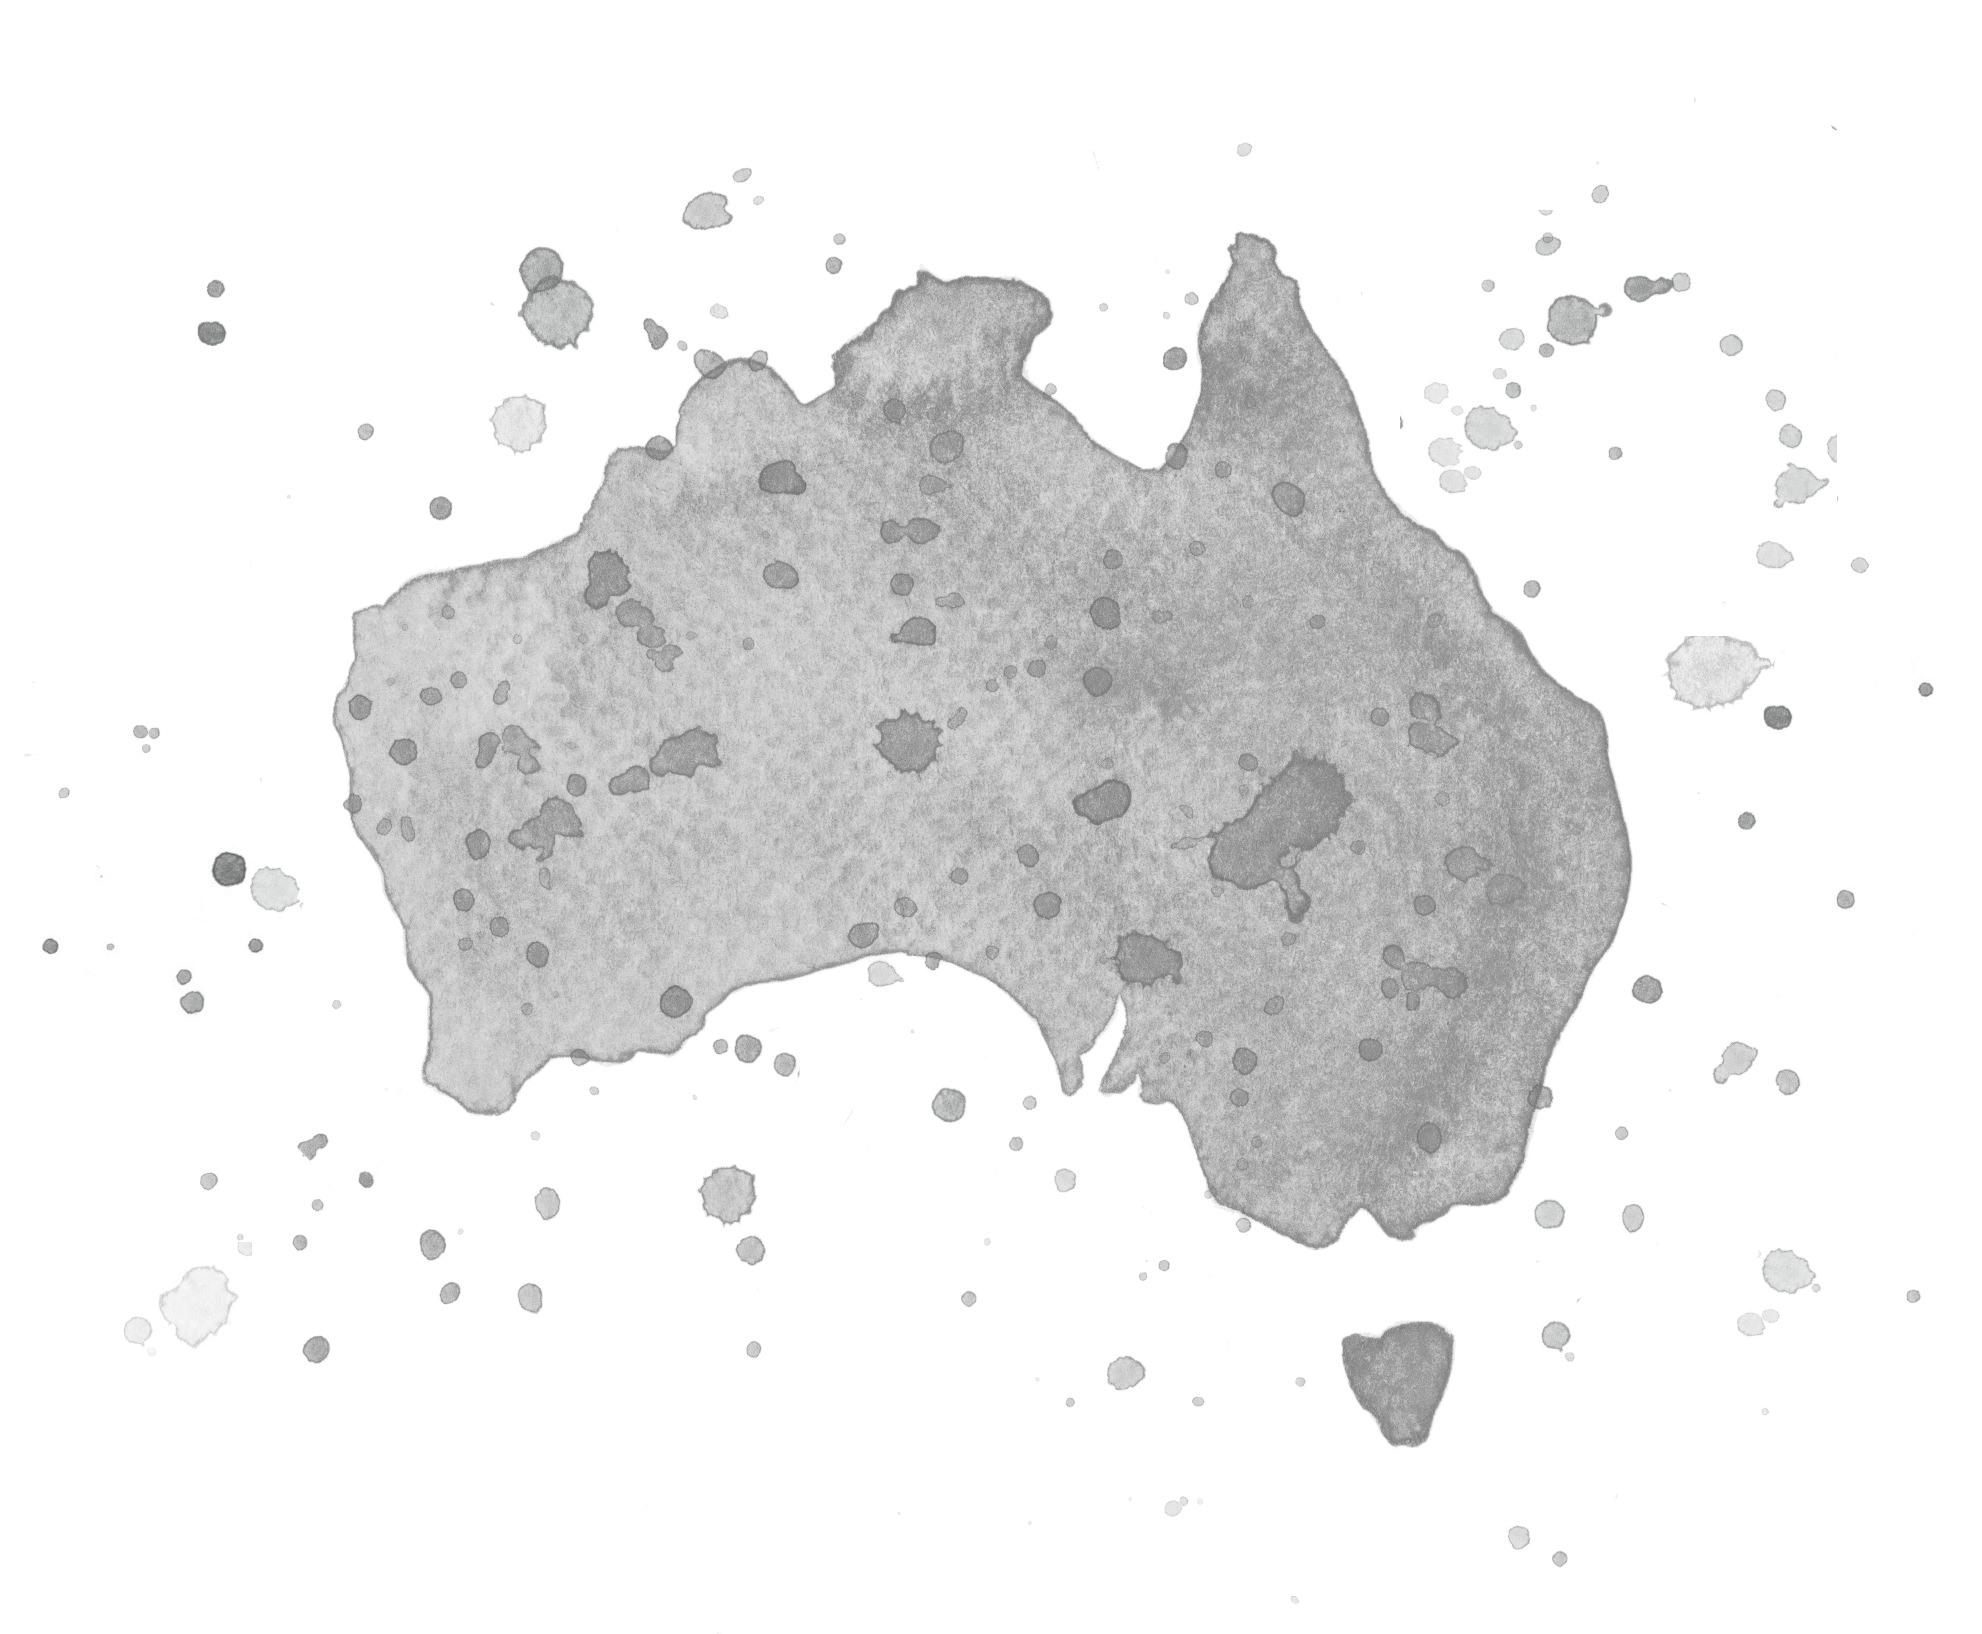 Australia gray cF copy 2.jpg